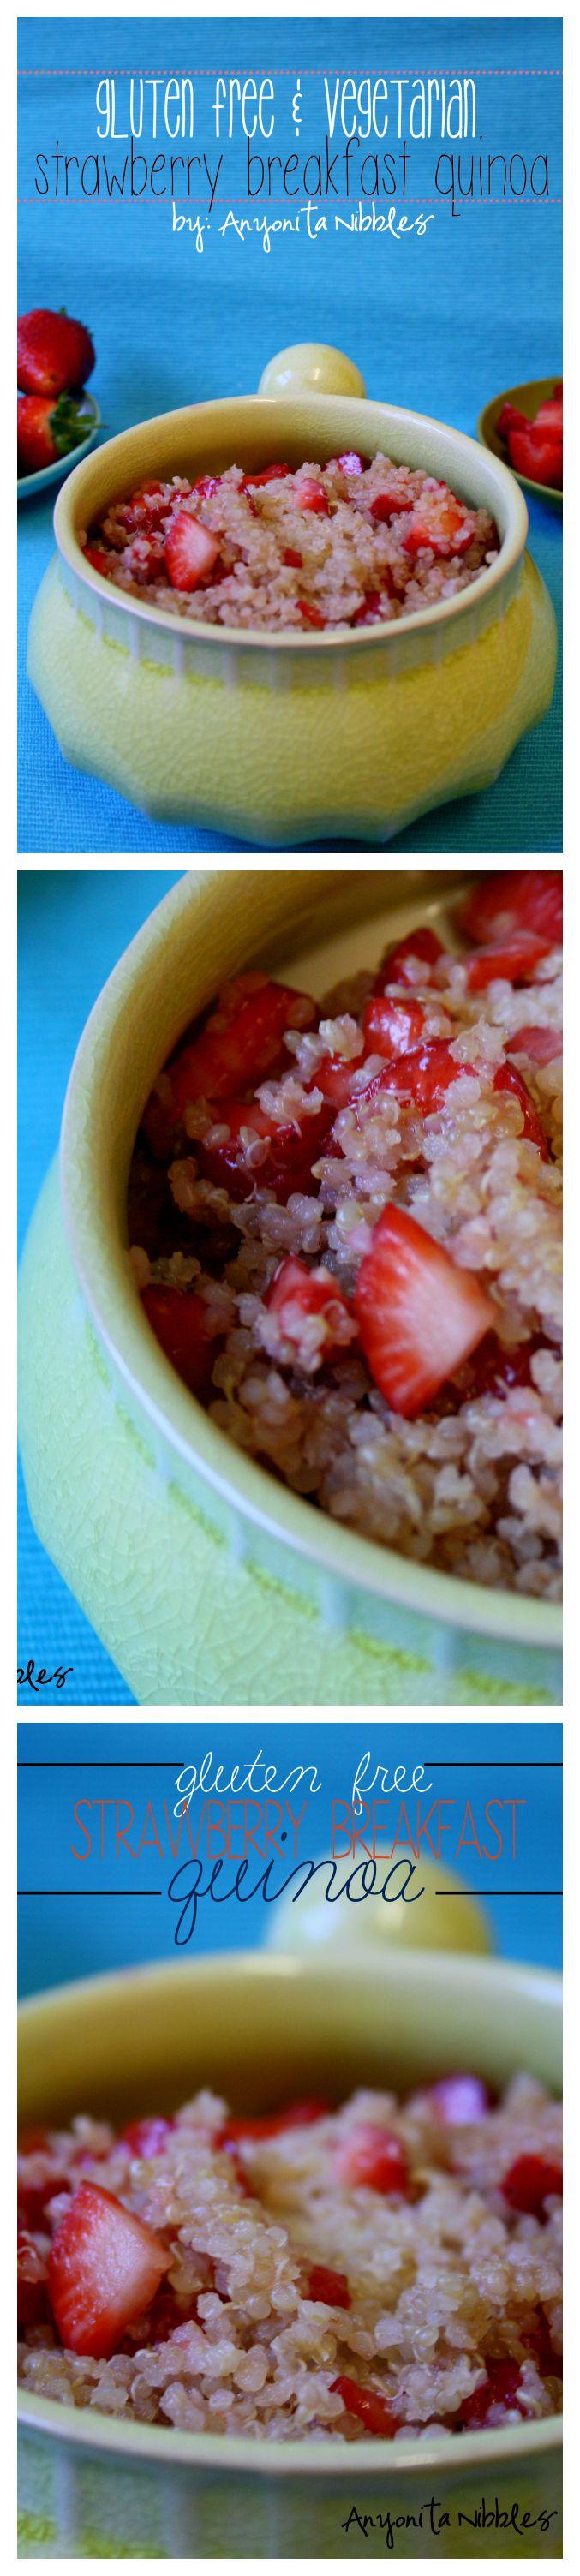 Gluten Free Vegetarian Breakfast Recipe: Strawberry Breakfast Quinoa #glutenfree #quinoa